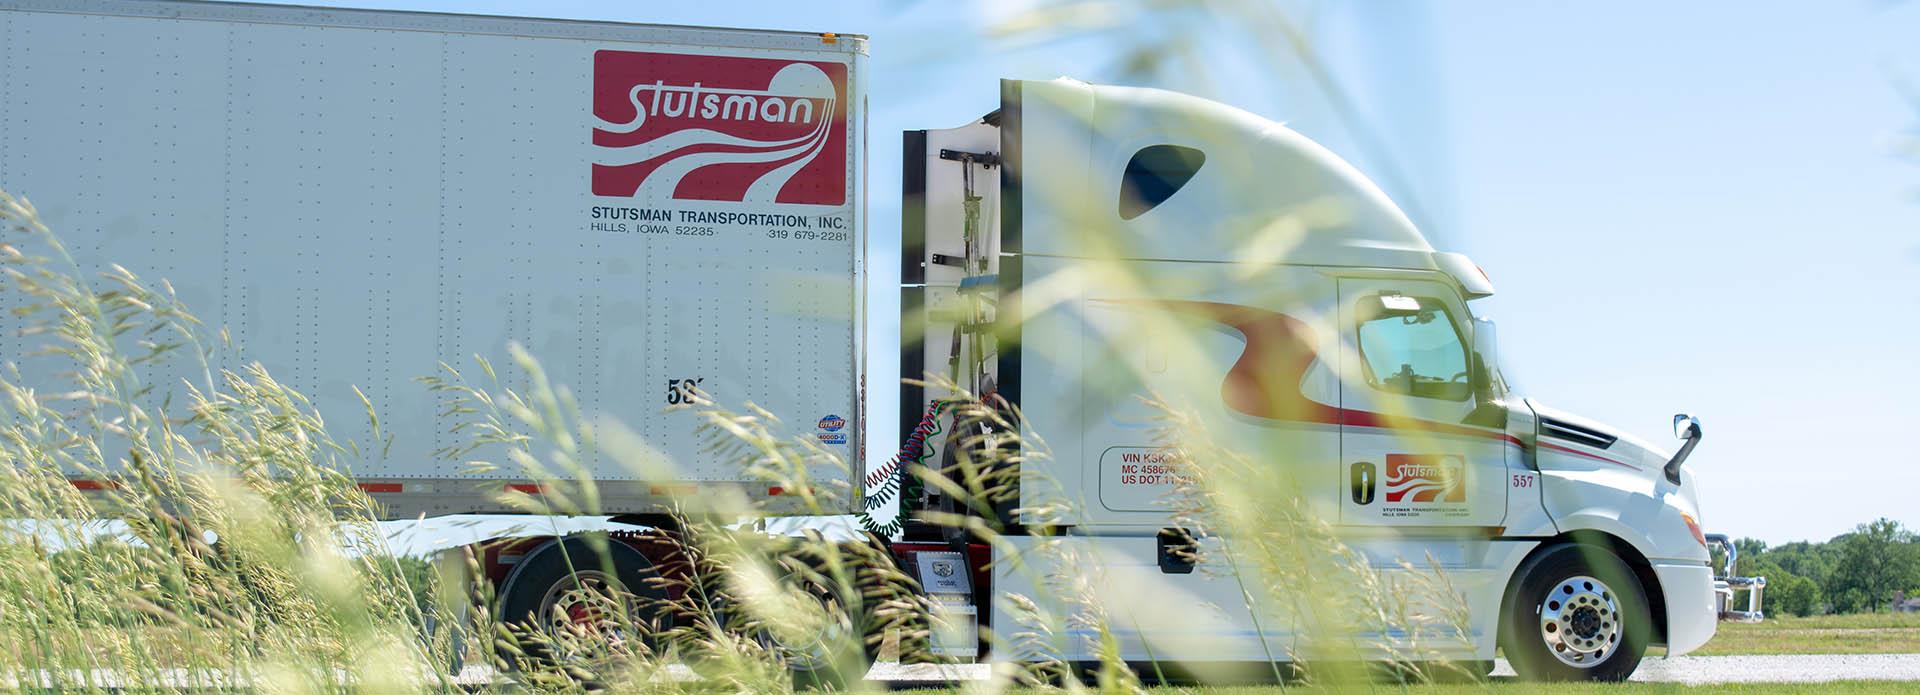 Eldon-C-Stutsman-Inc-Transportation (2)